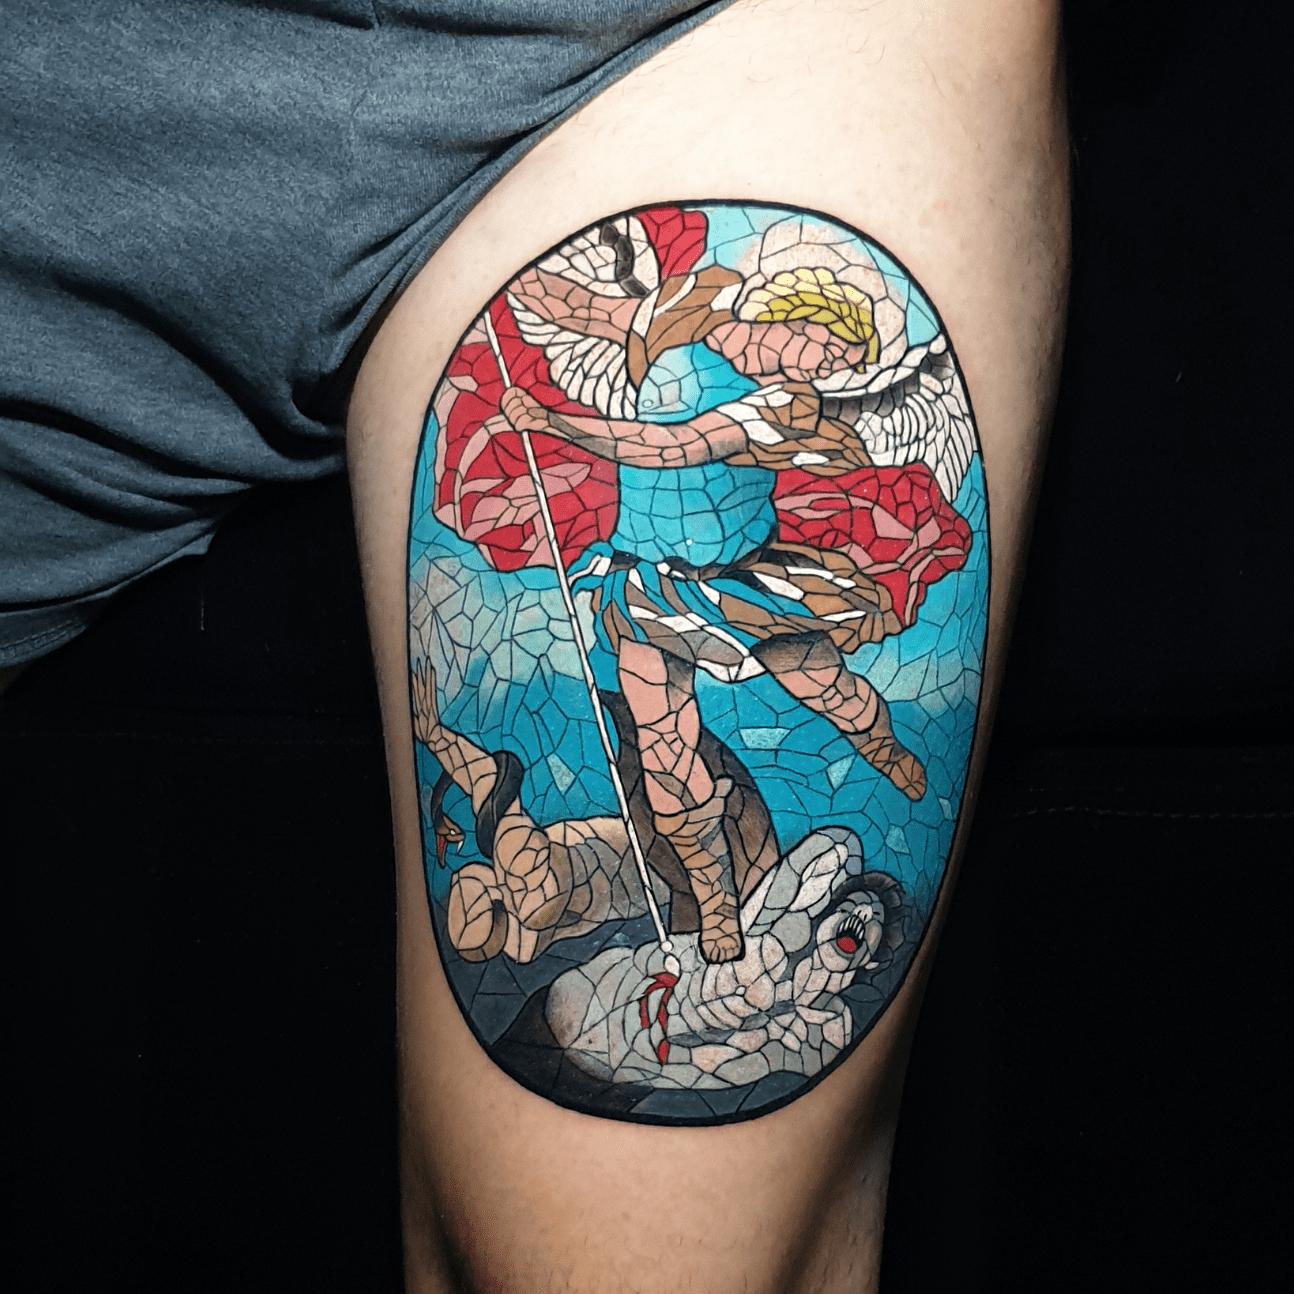 immagine san michele arcangelo - tattoo religiosi